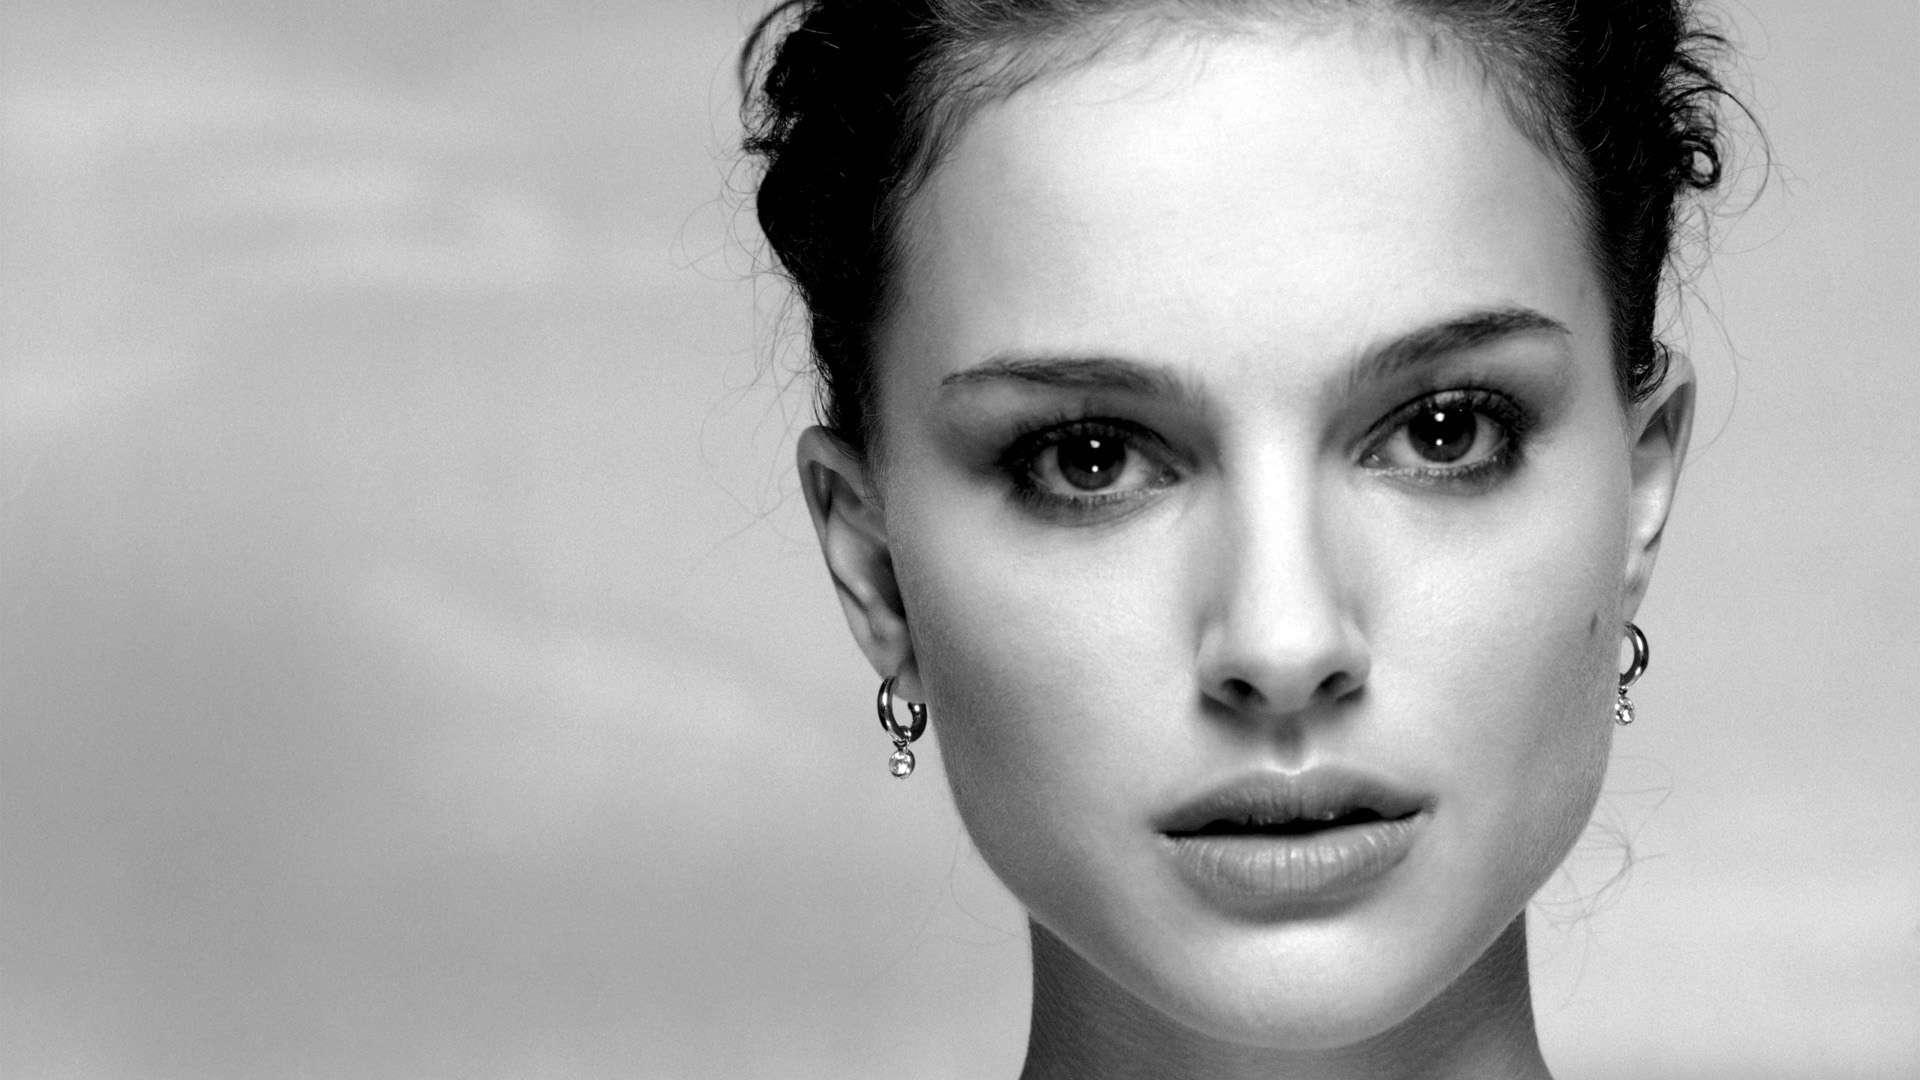 Natalie Portman Wallpapers HD Download 3188 Full HD Wallpaper ...